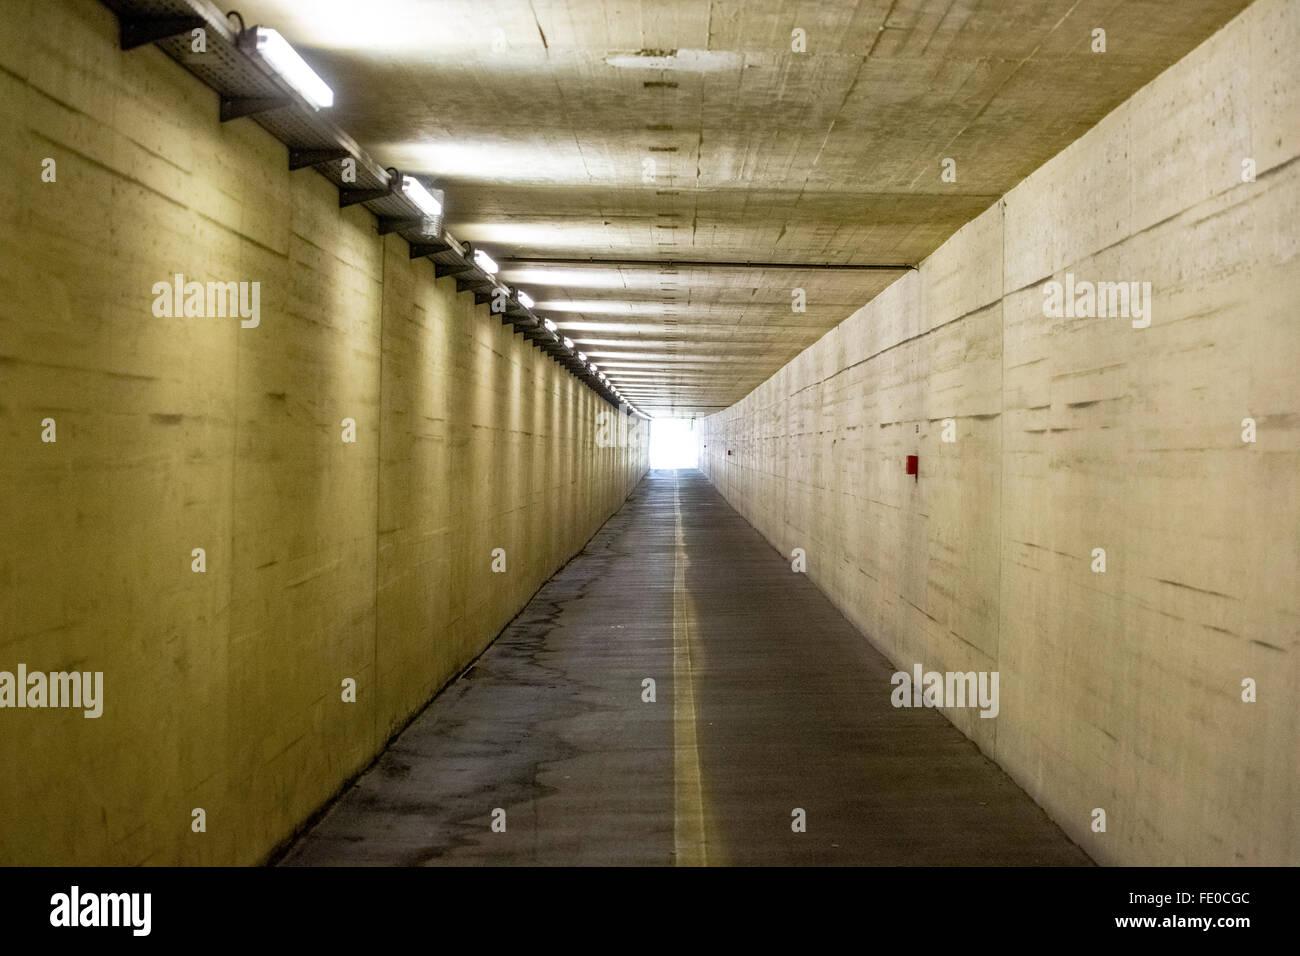 Tunnel, Flughafentunnel Salzburg, Salzburg, l'anxiété du tunnel, Salzburg, Autriche, Europe, vue aérienne, les oiseaux Banque D'Images